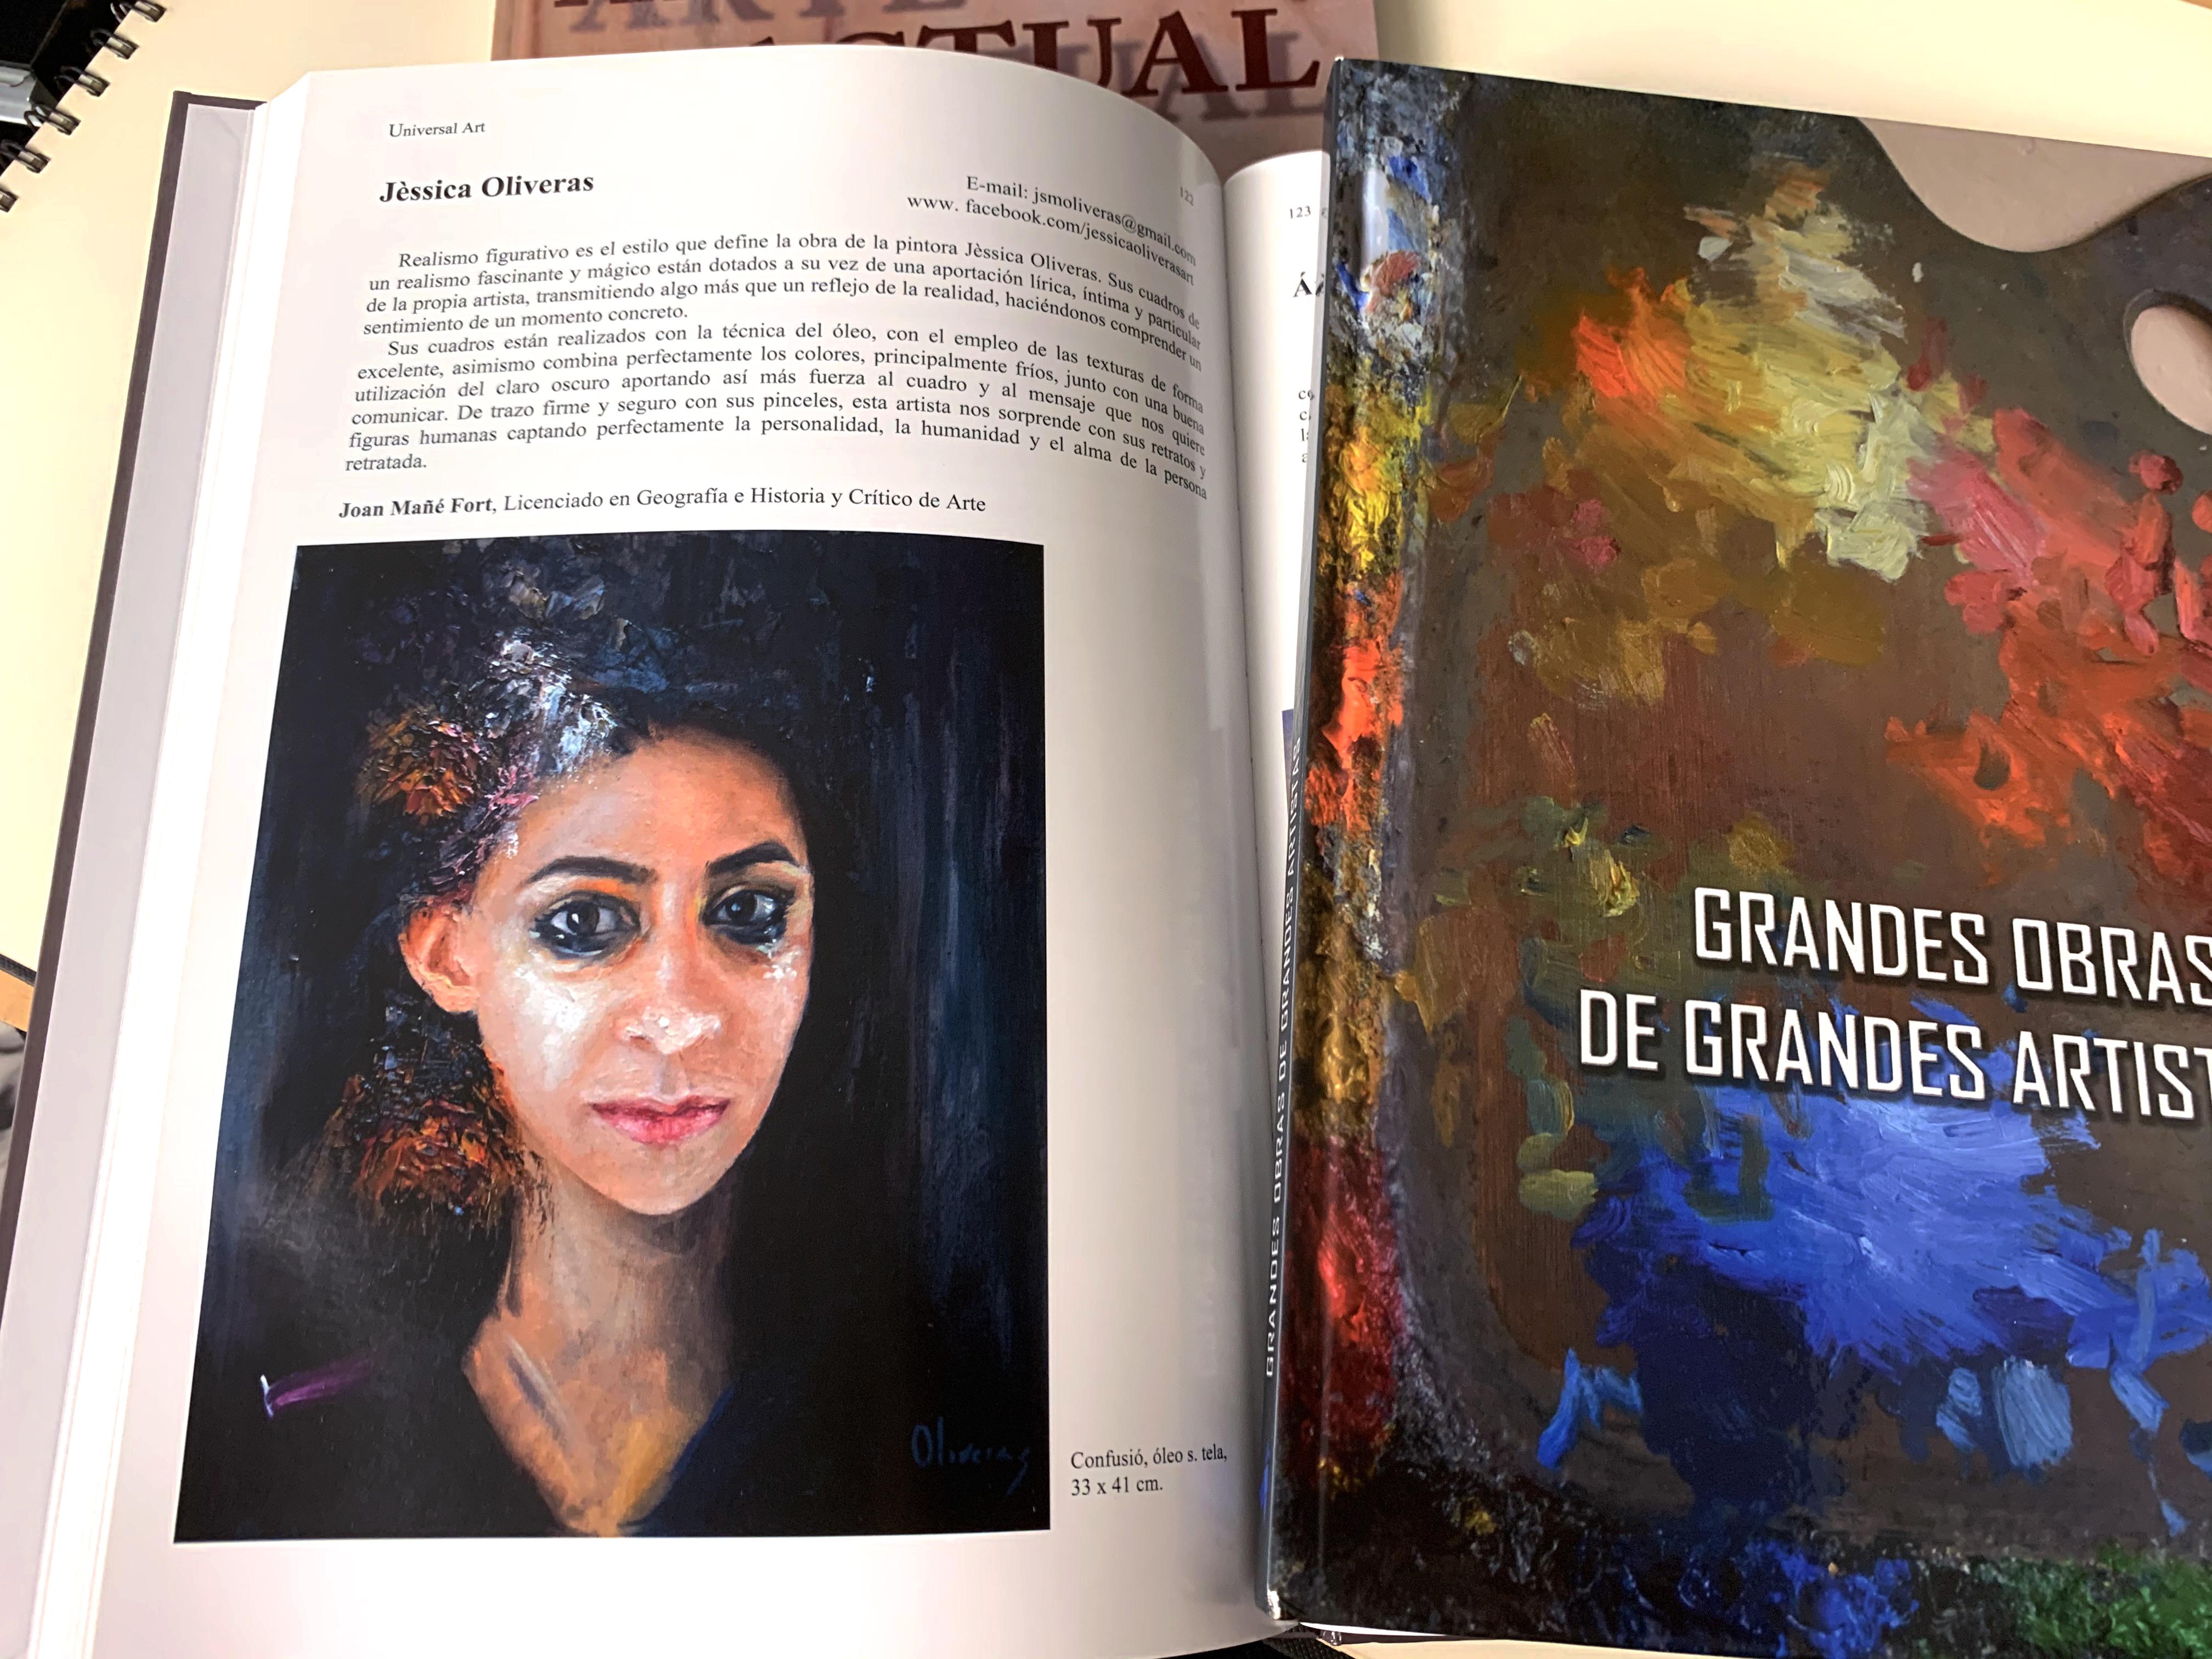 jessica oliveras publications 2